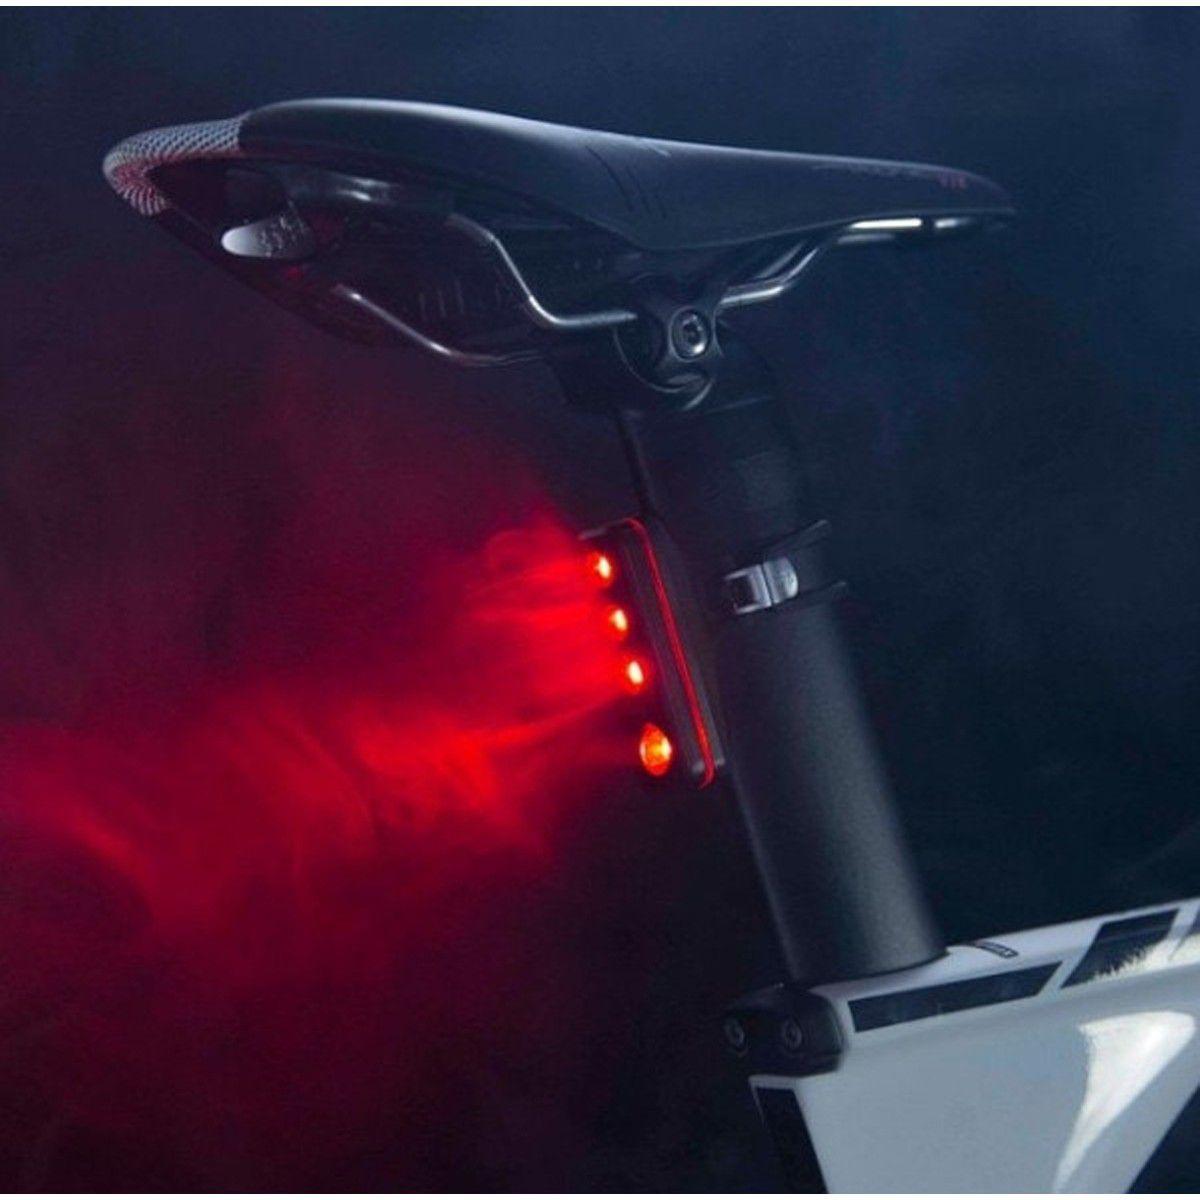 LANTERNA TRASEIRA KNOG BLINDER ROAD R70 A PROVA DAGUA PRETA CARREGA VIA USB